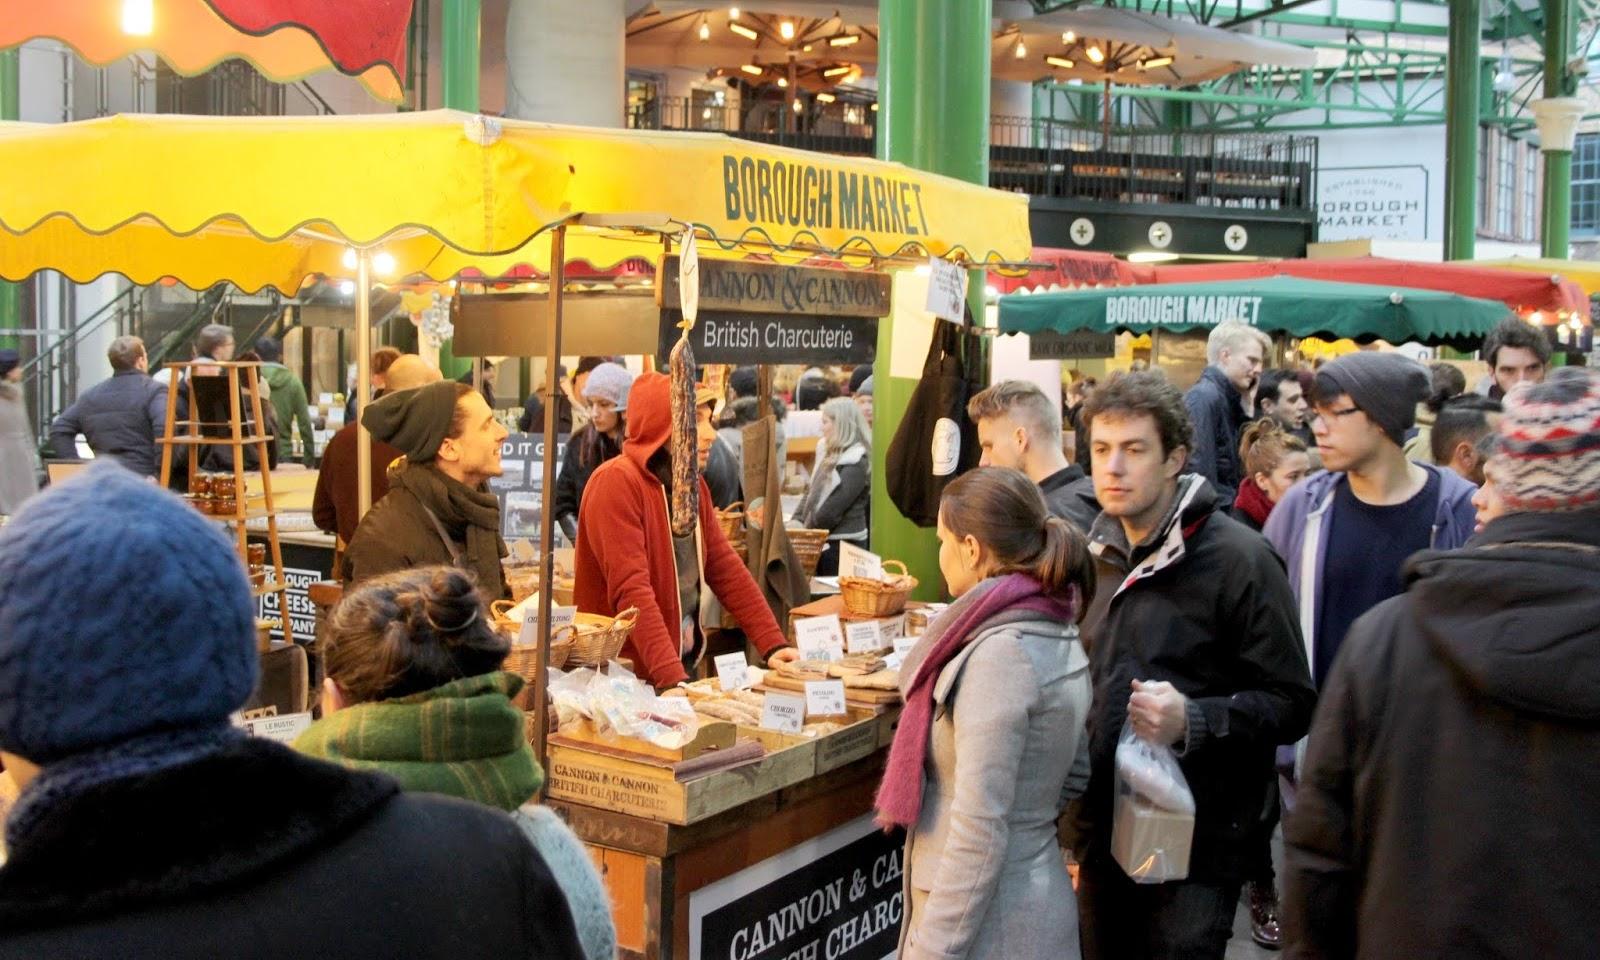 Clashing Time talks Borough Market